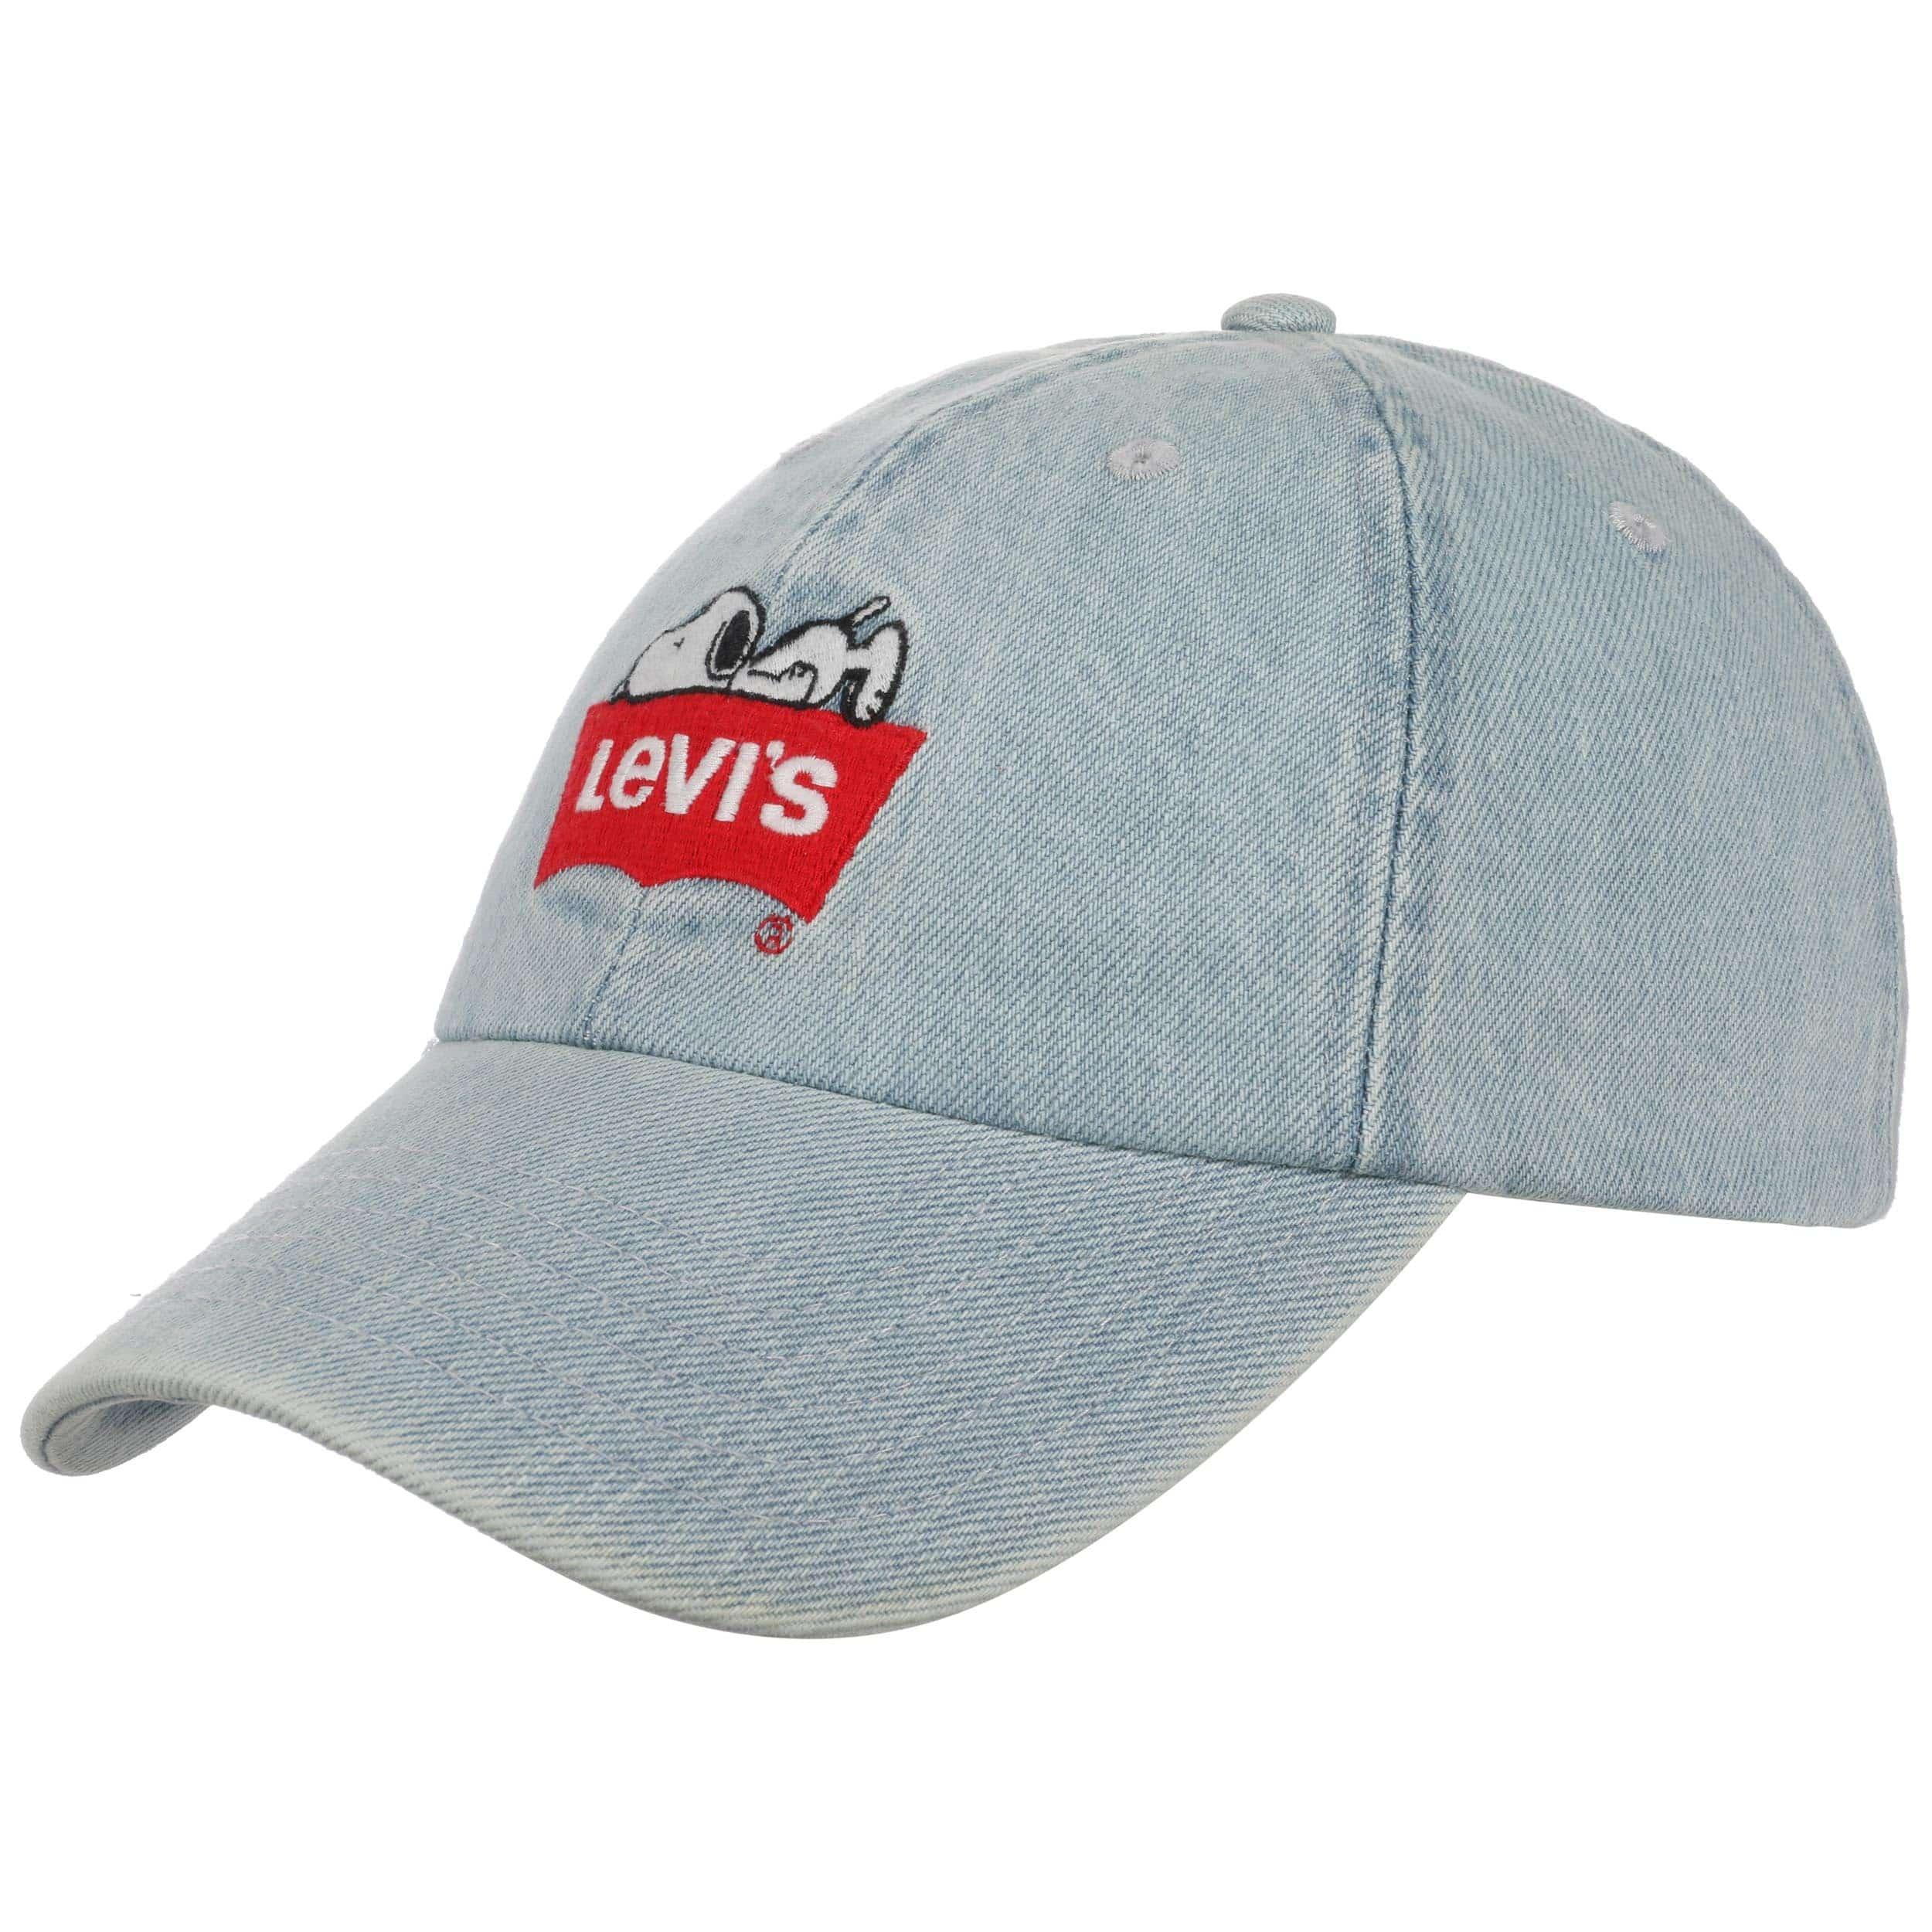 Snoopy Baseball Cap - Blue Levi's NbFoxH3Fzq